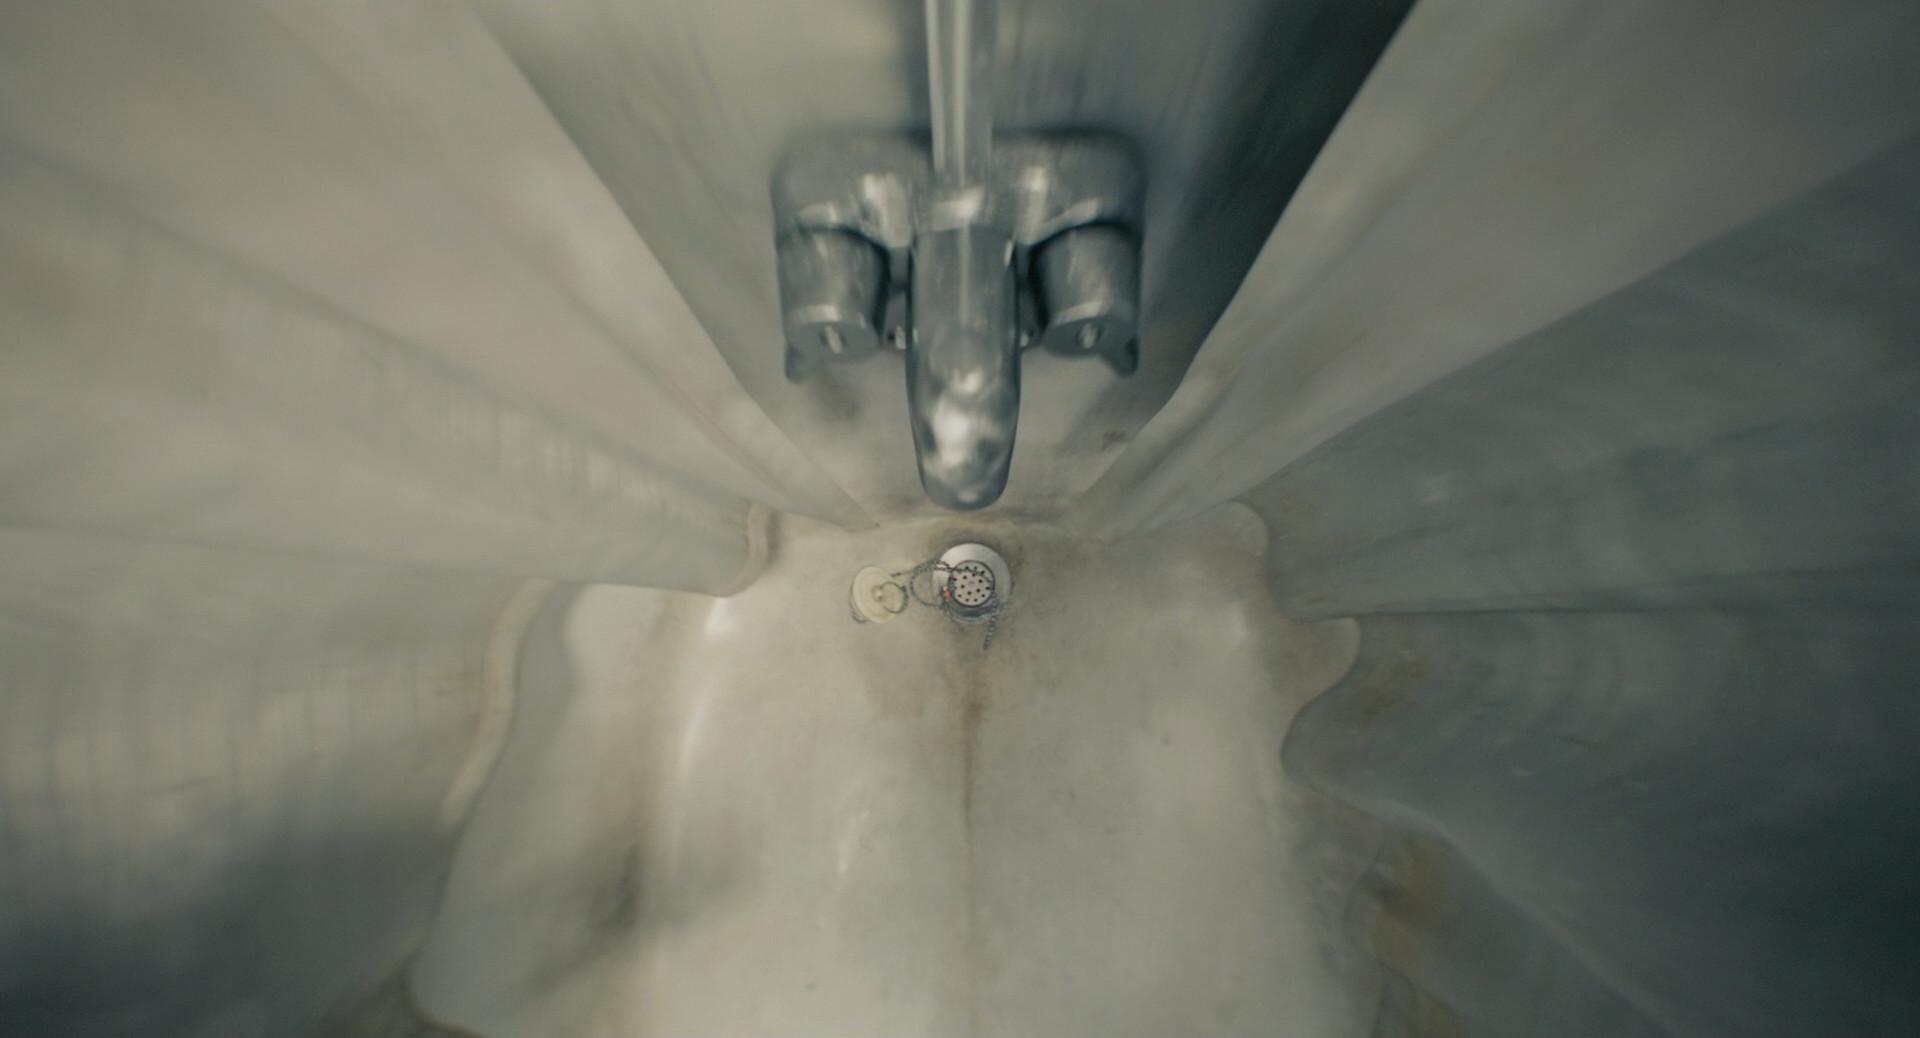 Saby menyhei antman bathtub000 resize